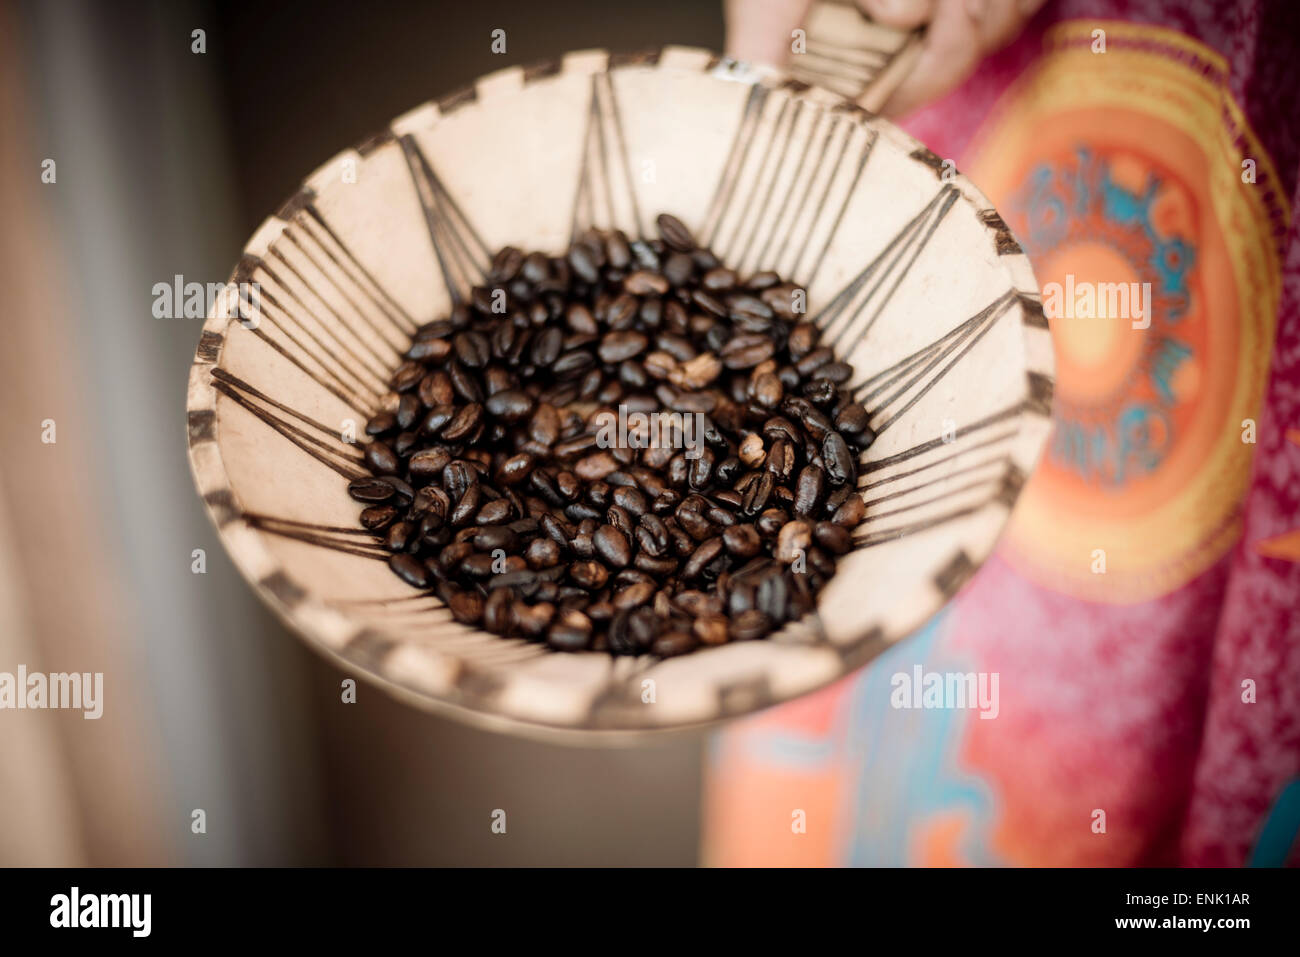 Los granos de café, Valle de Omo, Etiopía, África Imagen De Stock